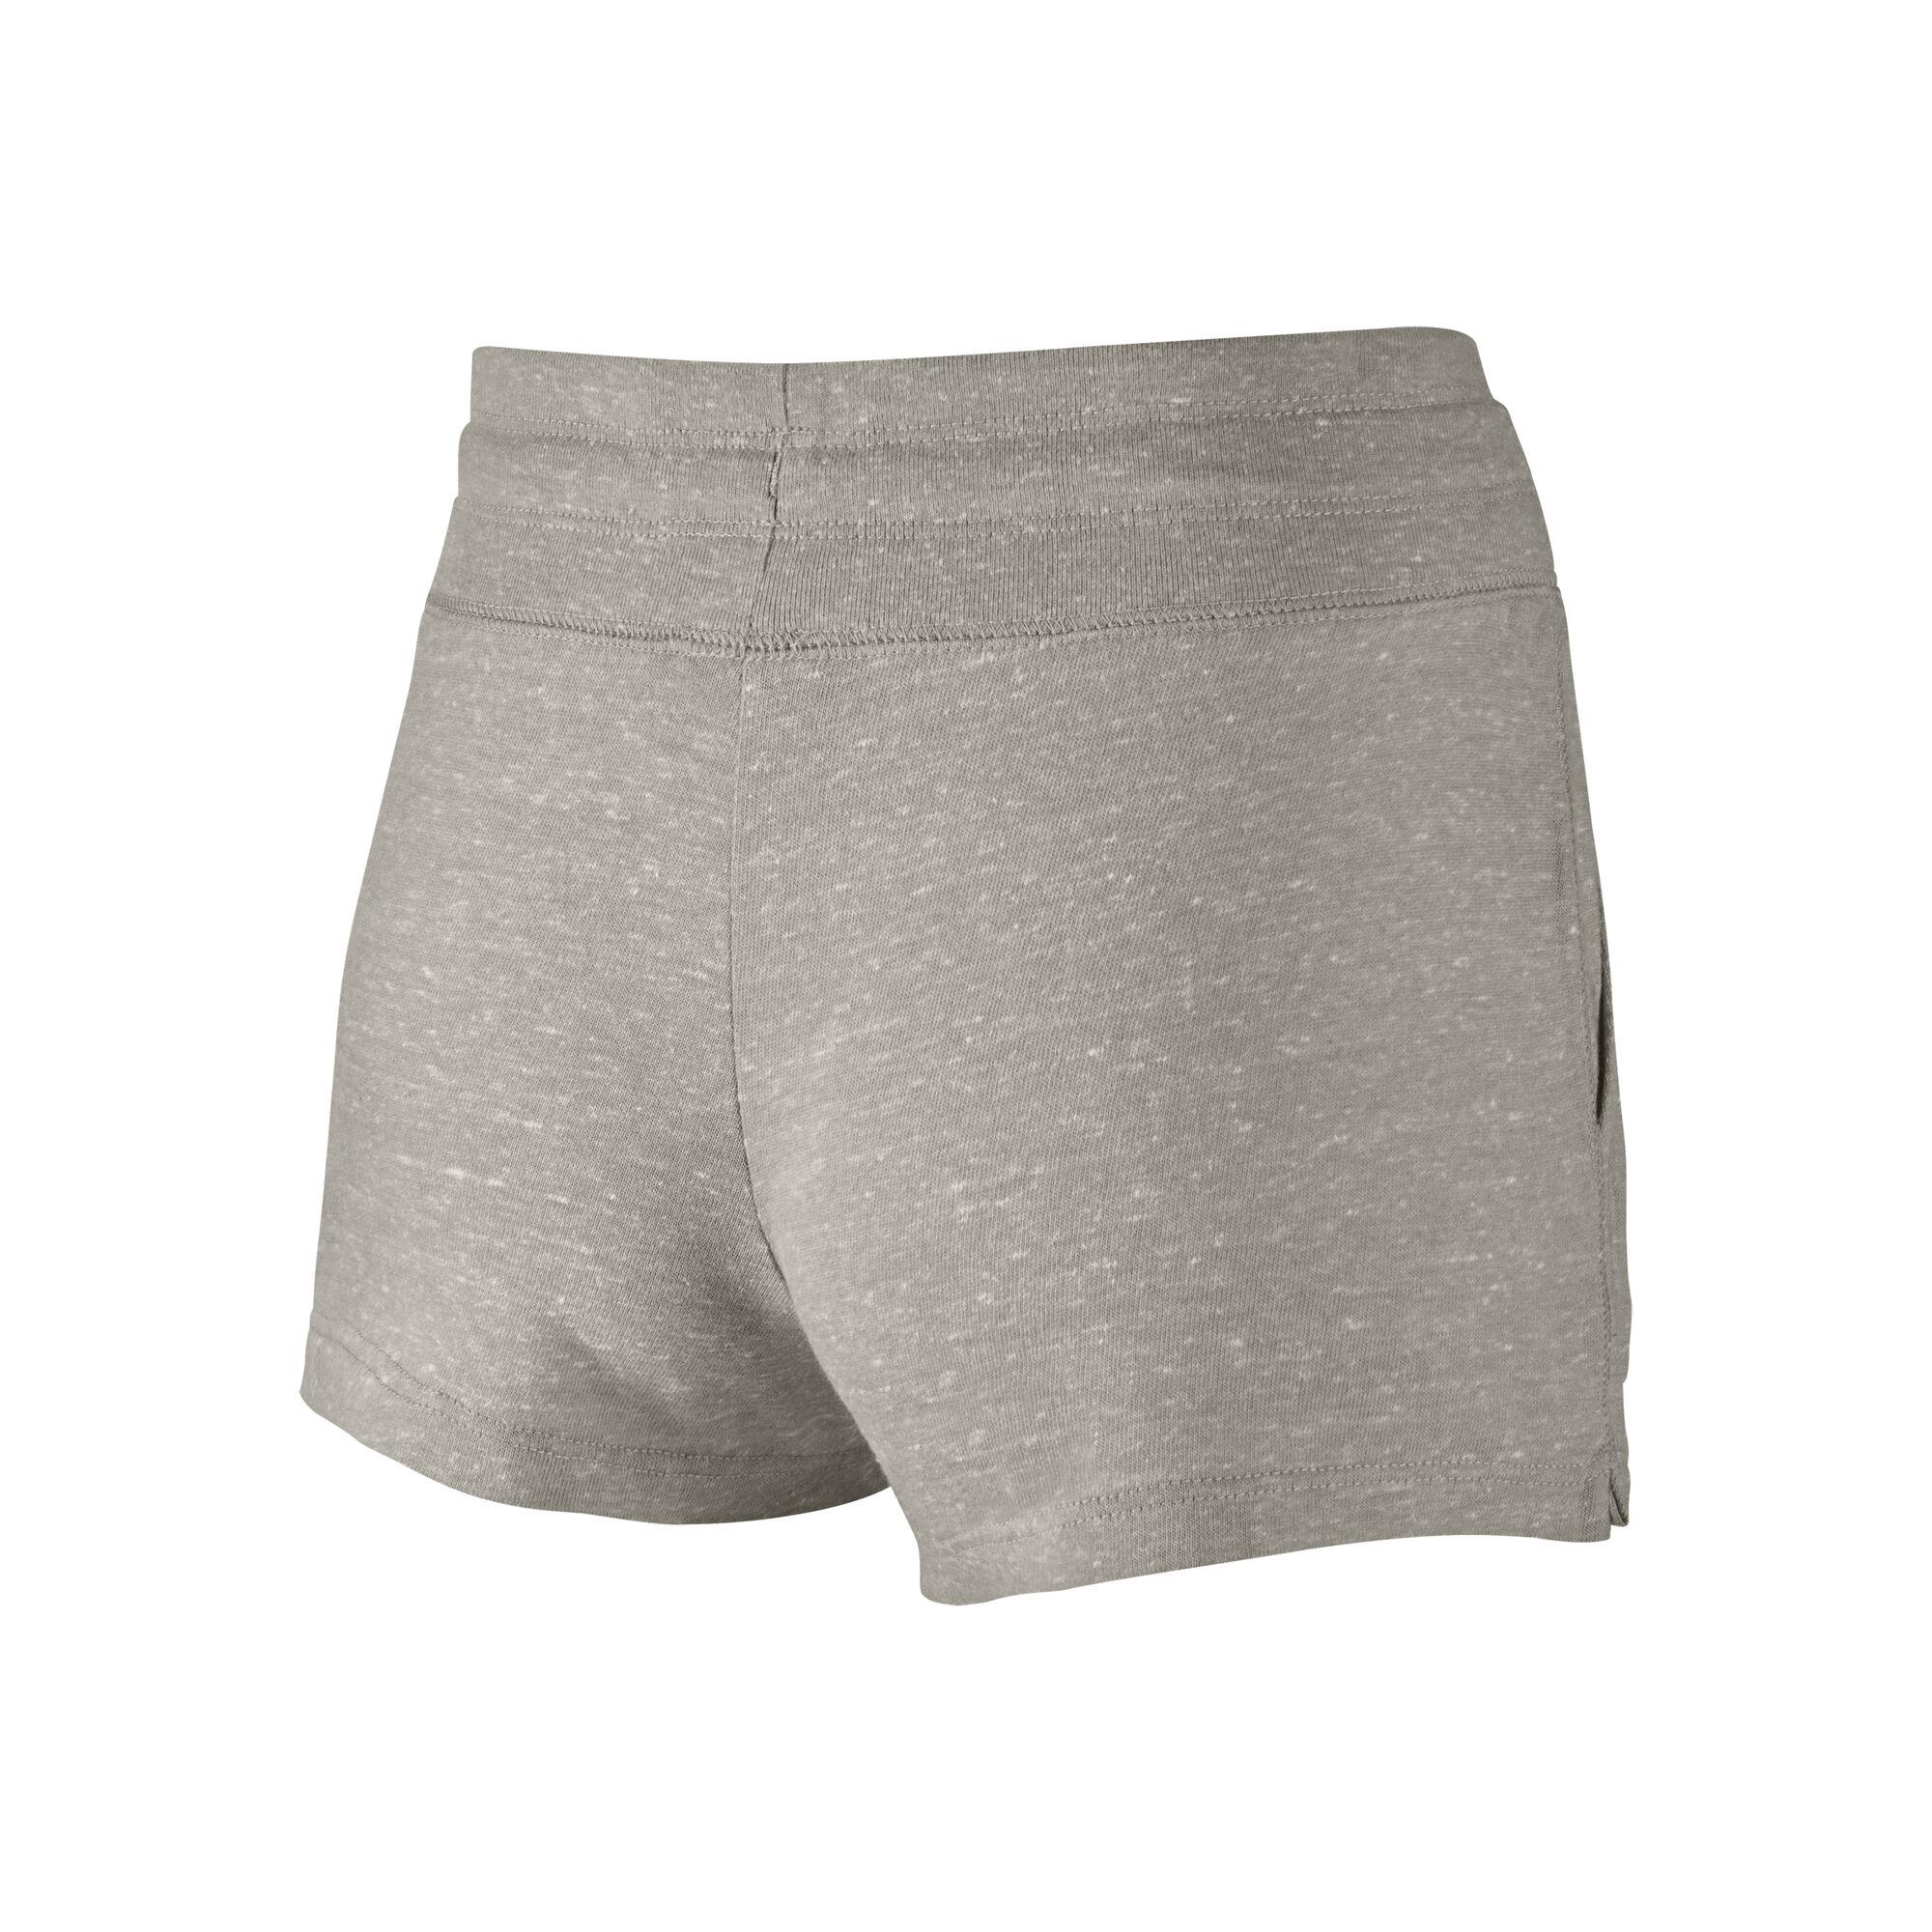 c22c086978d buy Nike Sportswear Gym Vintage Shorts Girls - Beige, Ecru online ...